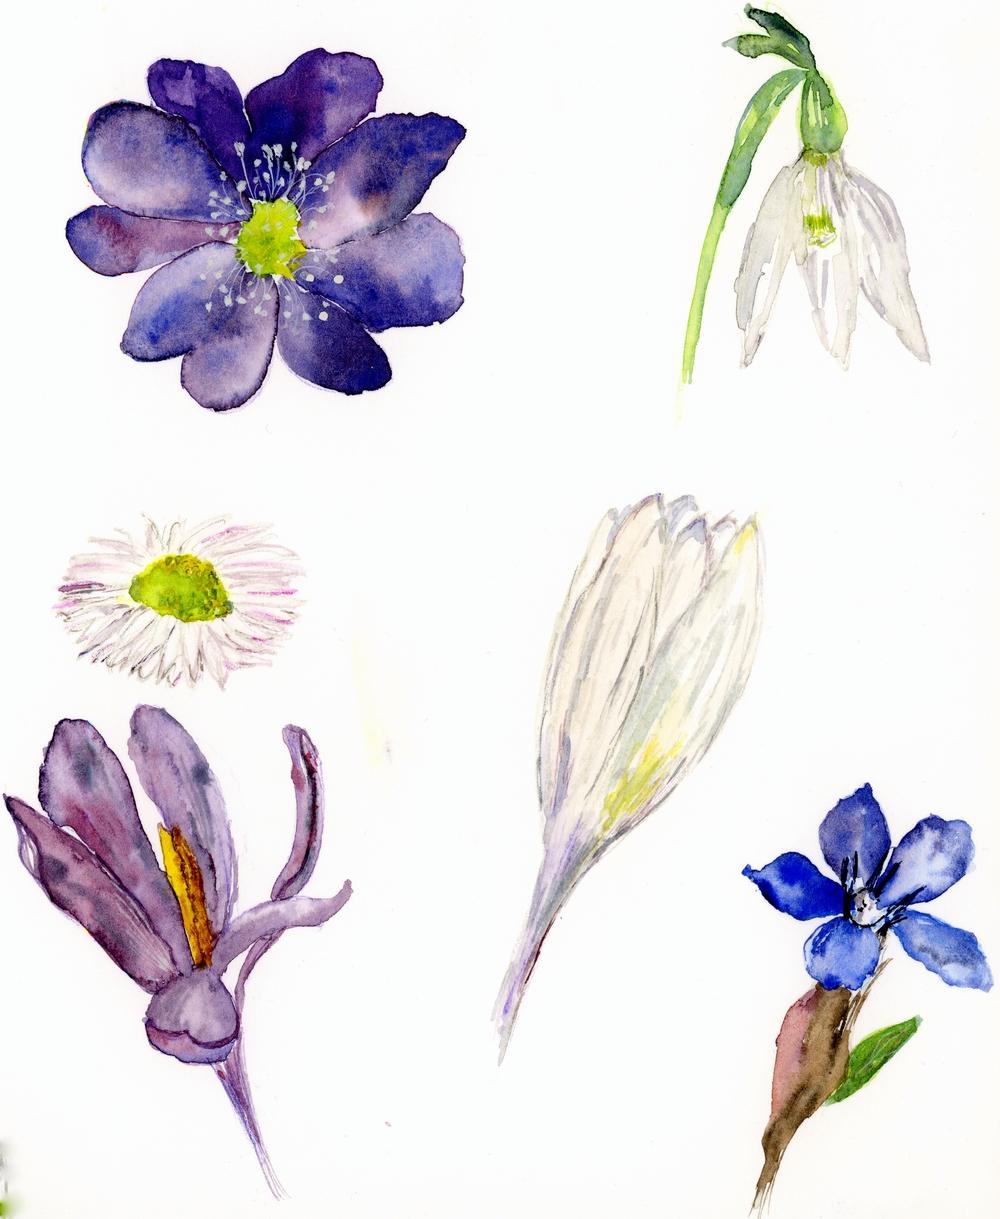 pomlad008.jpg